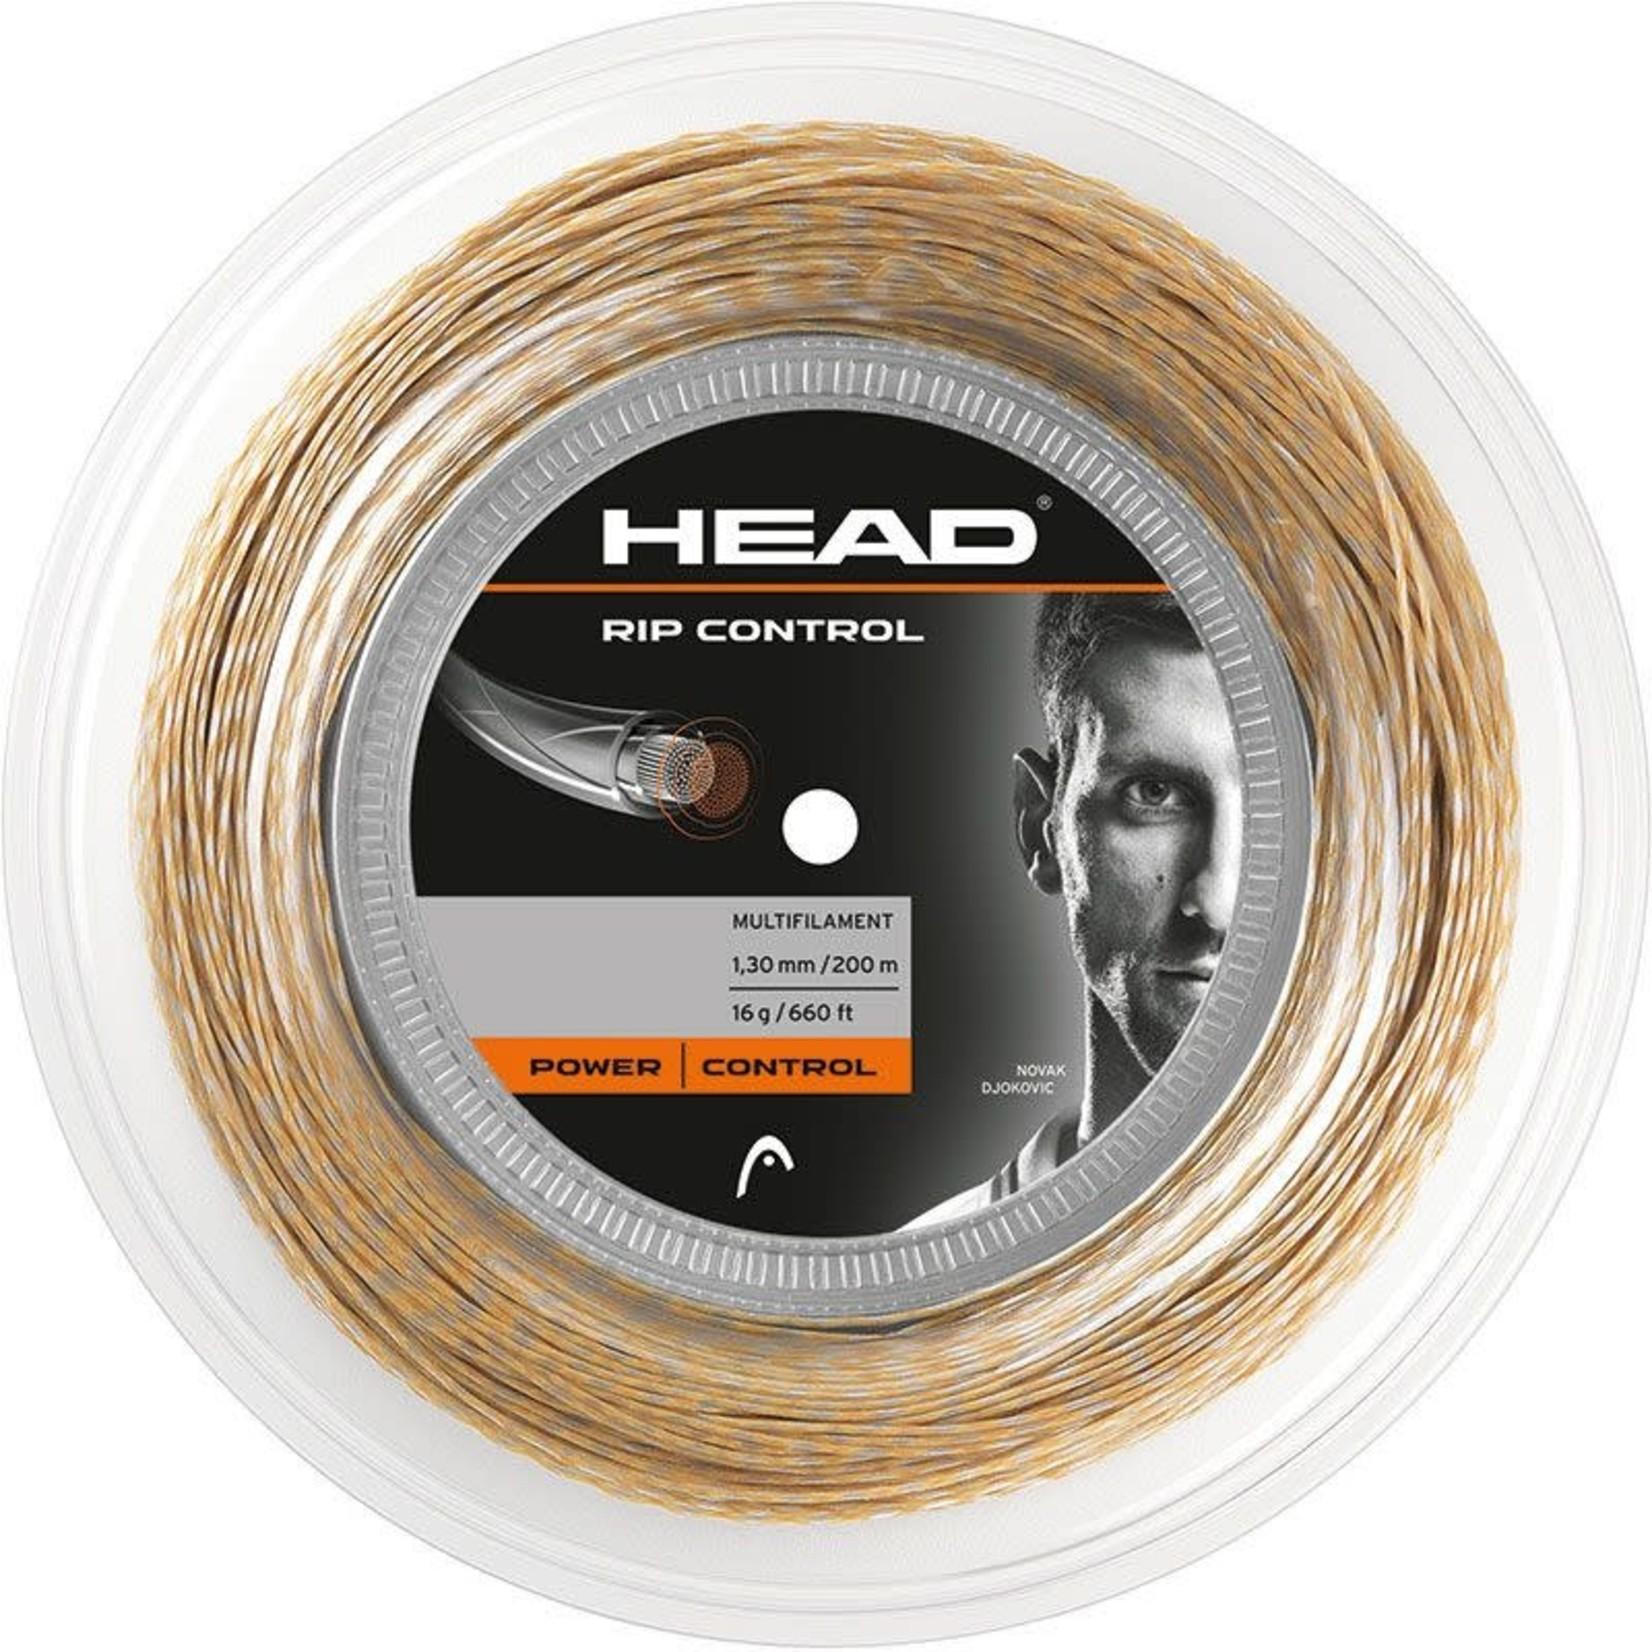 Head RIP Control - 200 meter